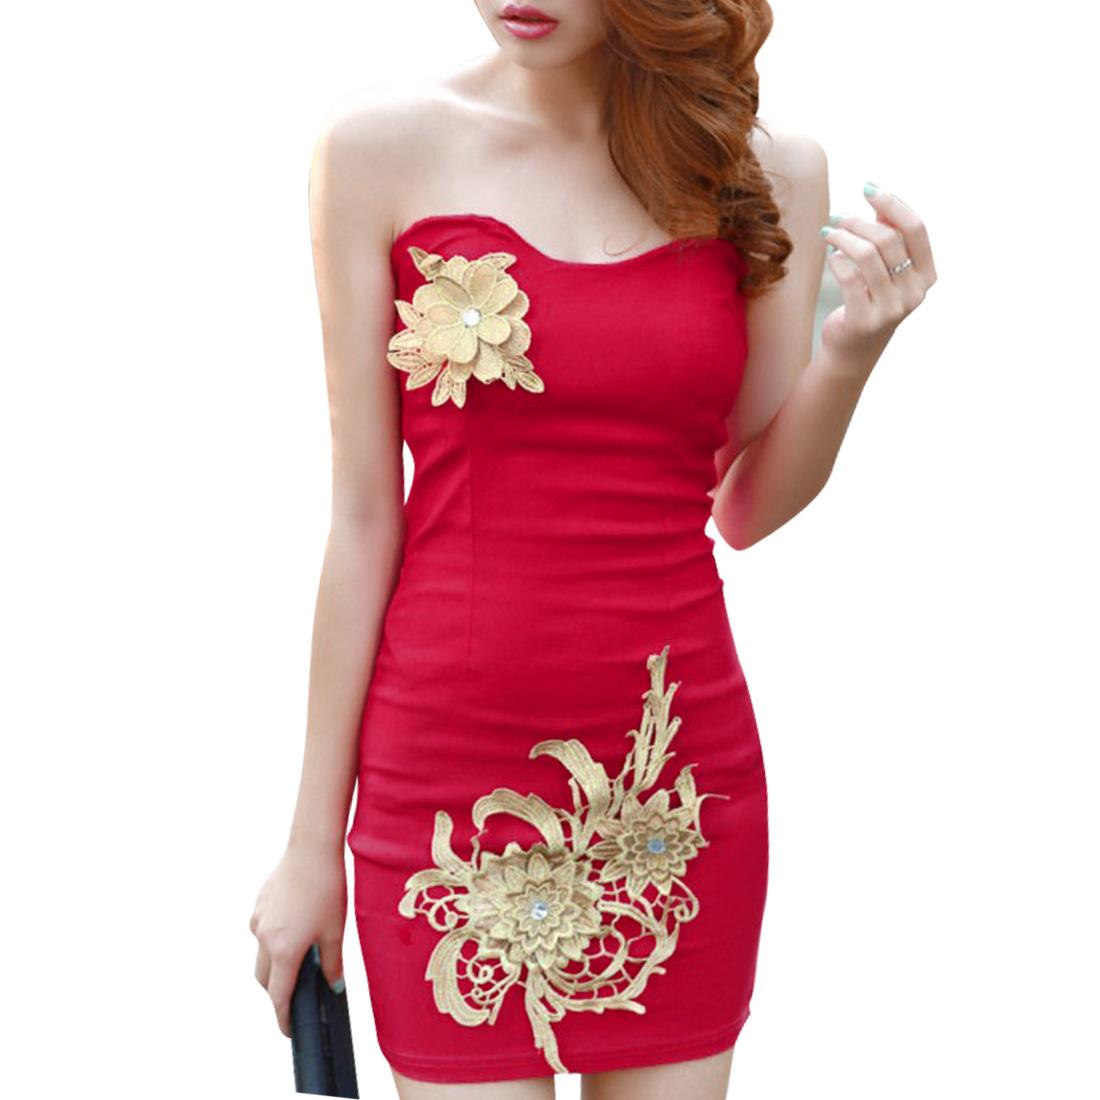 Strapless Elastic Back Fuchsia Skinny Mini Dress for Lady XS